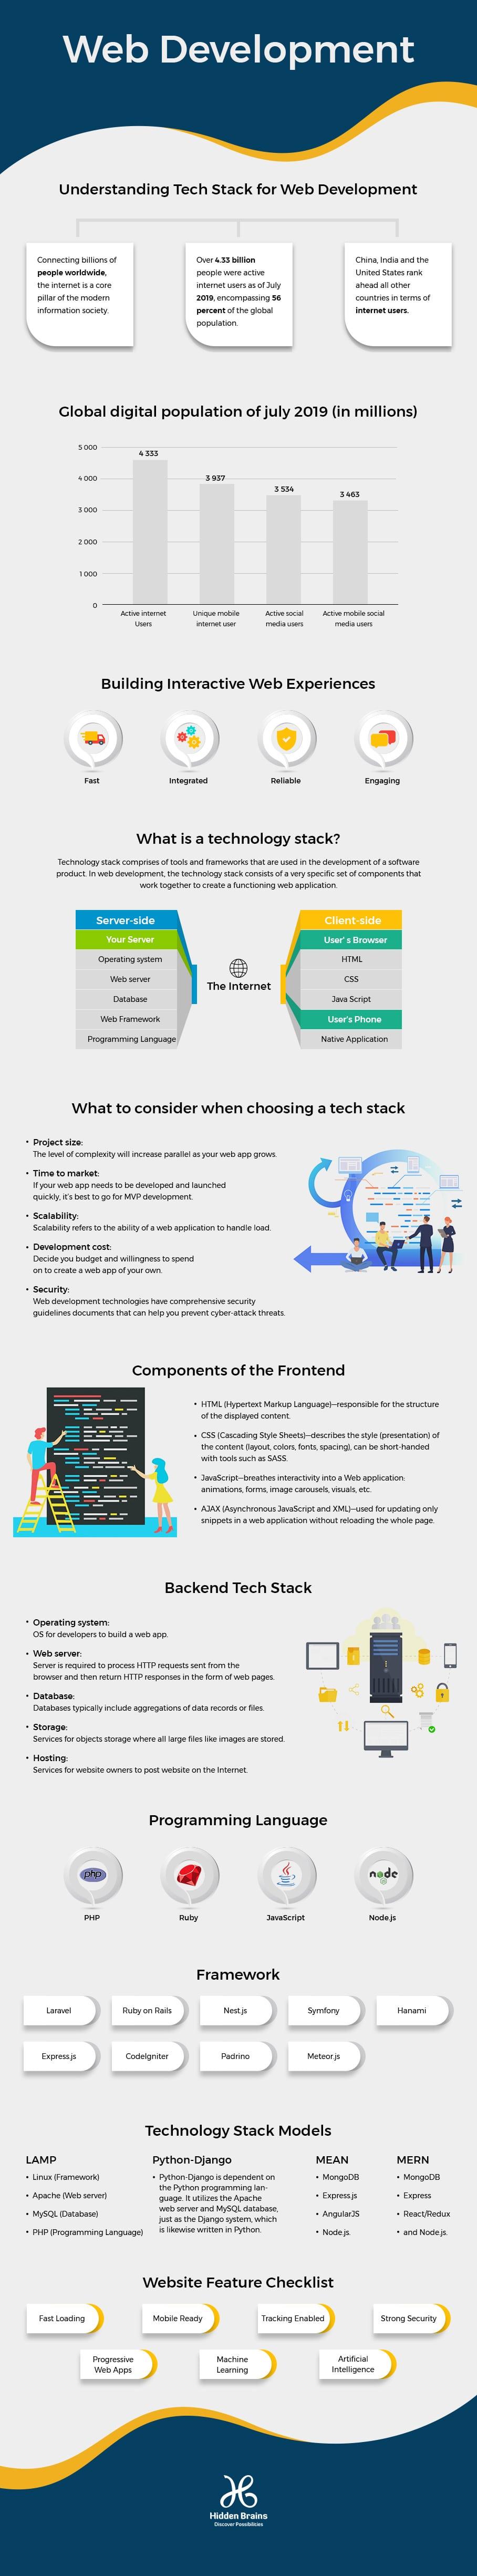 best technology stack for web development